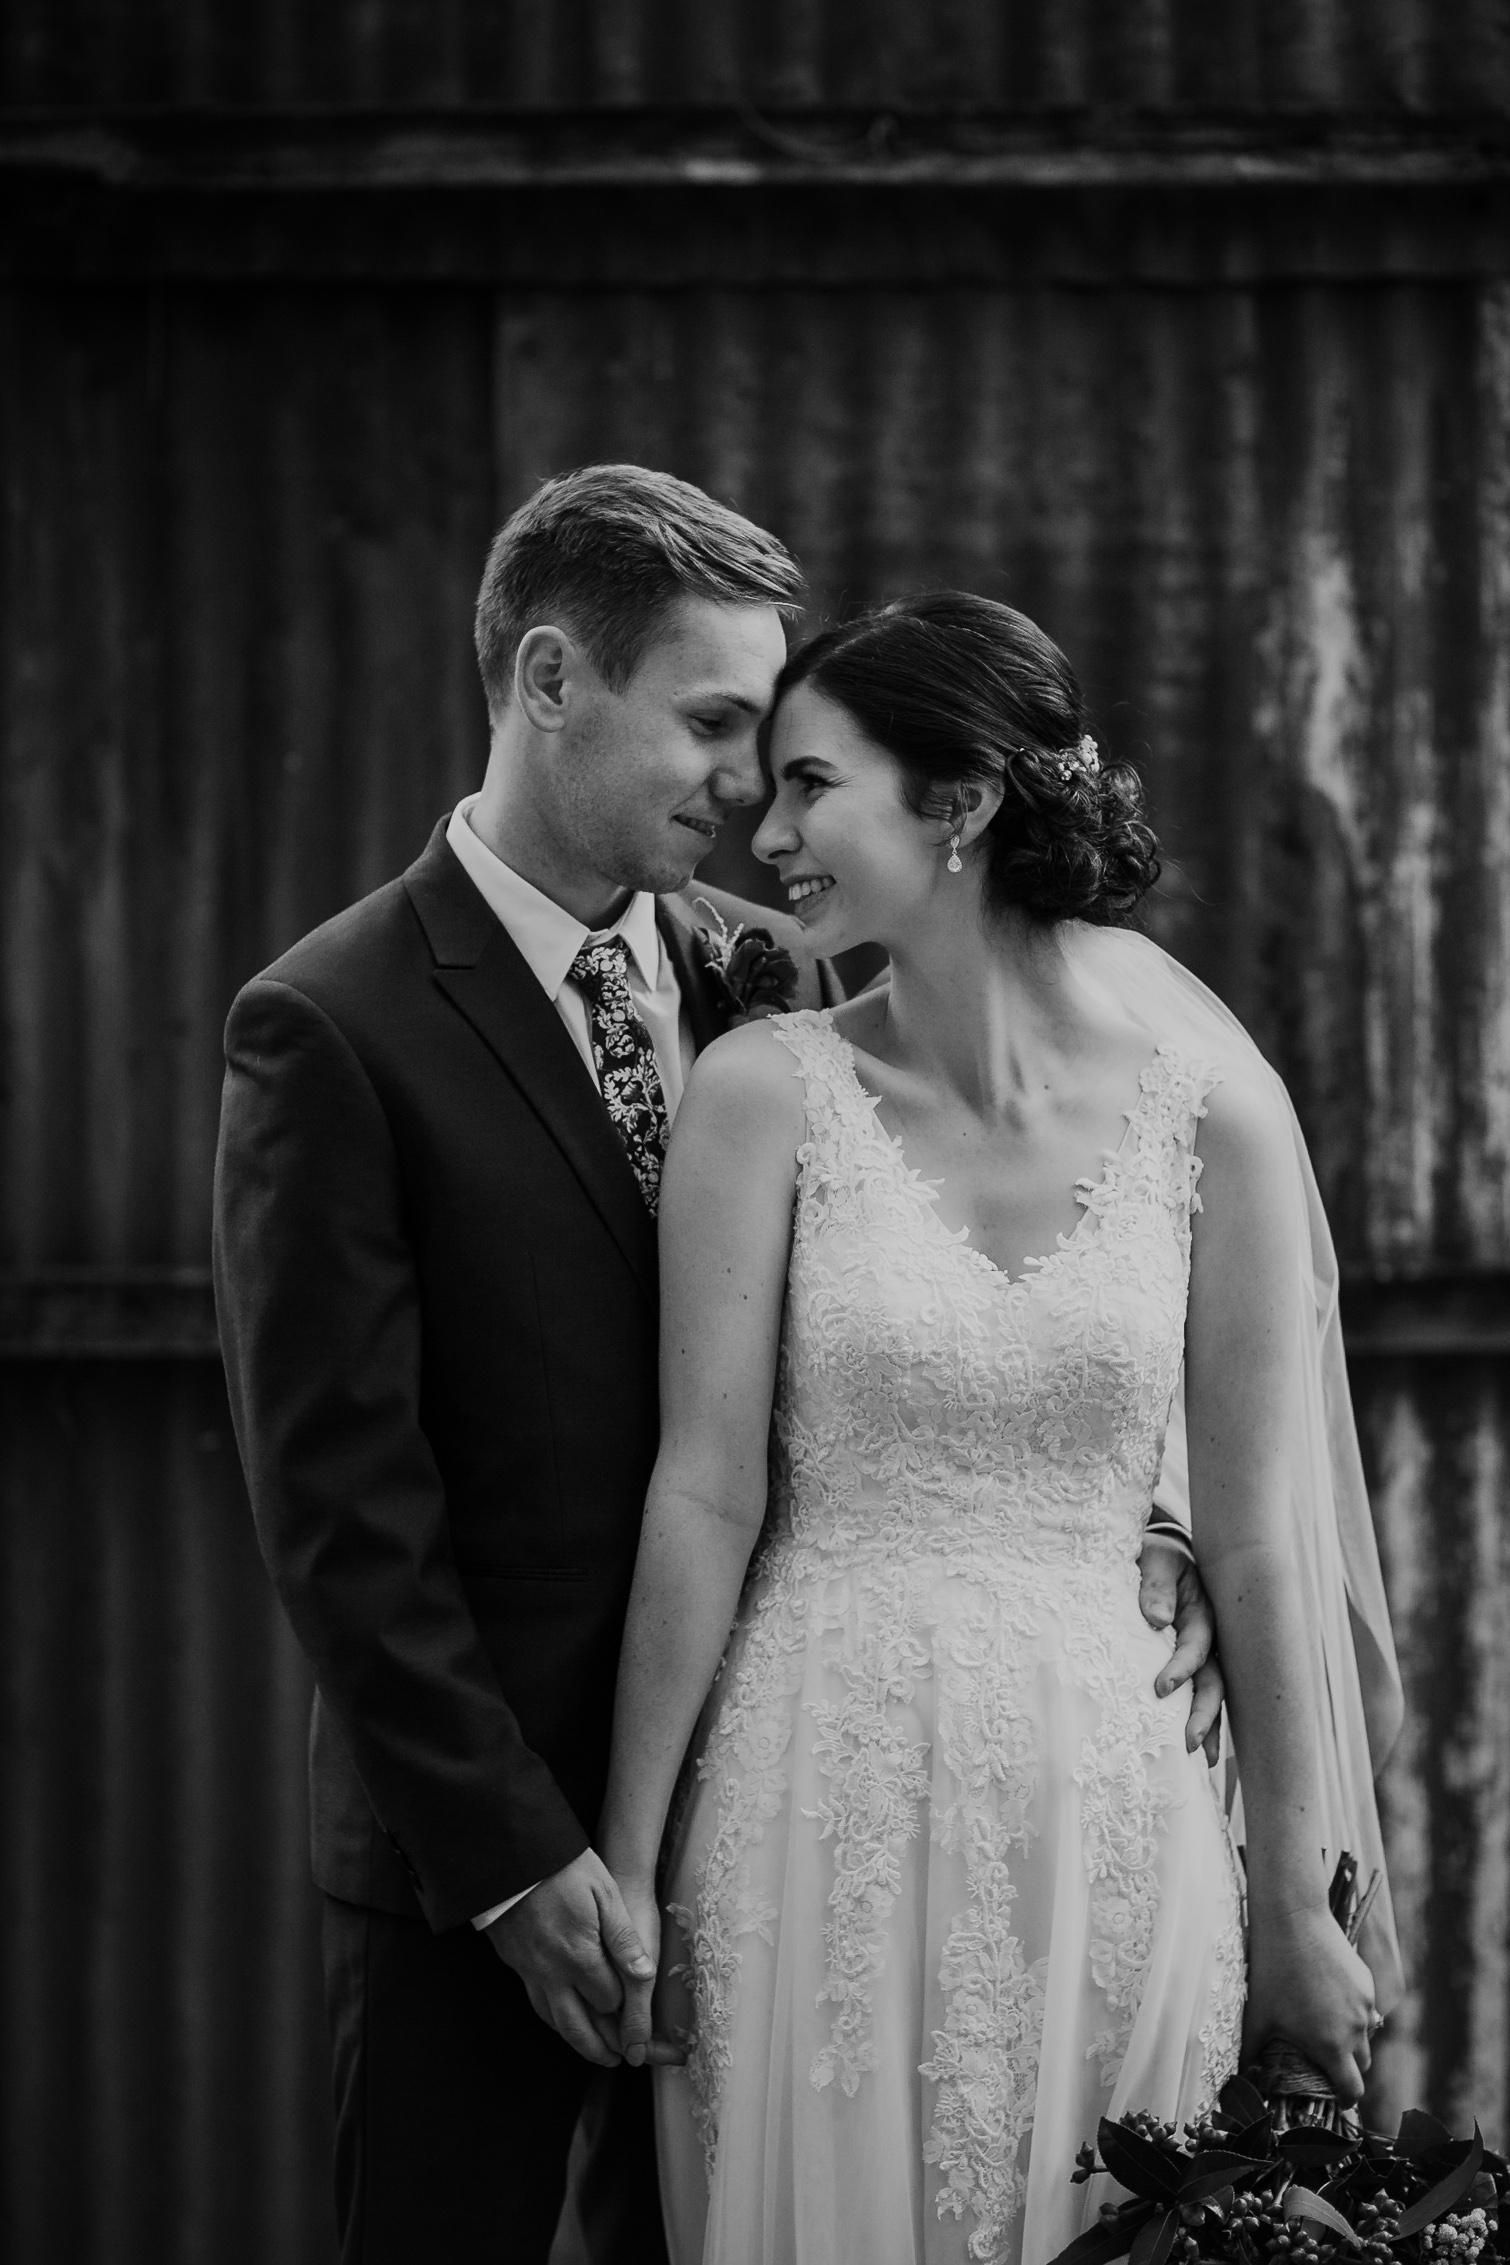 Boomerang_Farm_Gold_Coast_Wedding_Photography-236.jpg